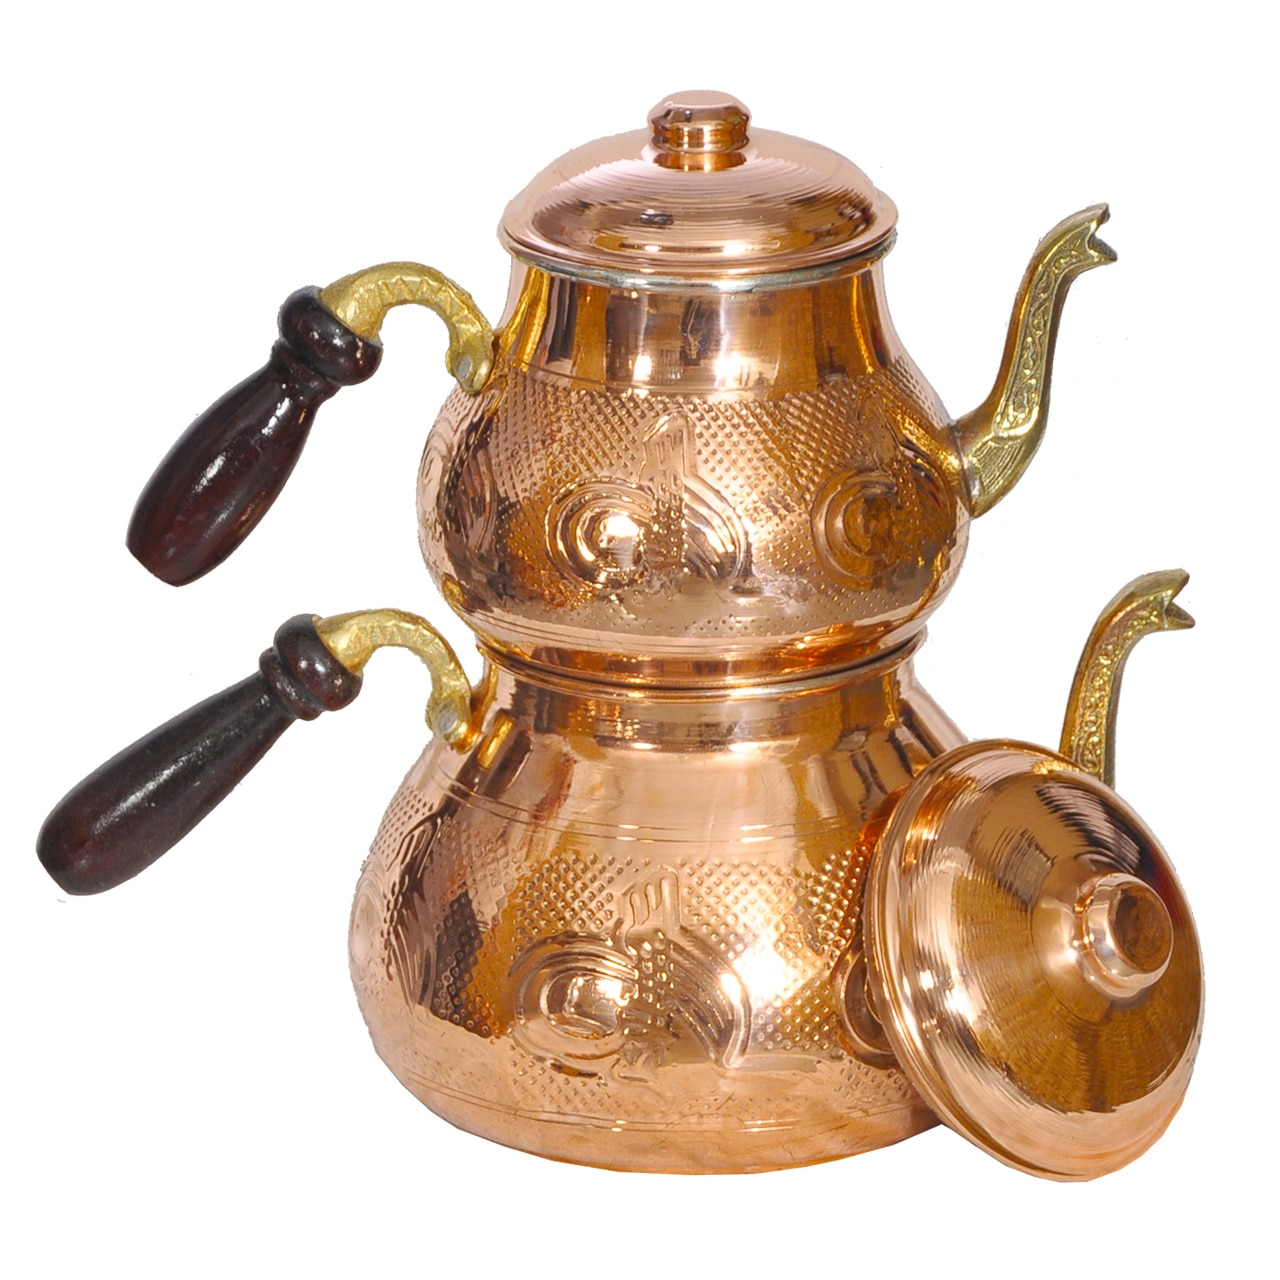 Thick material Turkish teapot Home Camping Picnic for  stannous teapot.турецкий Медный чайный сервиз Толстый материал